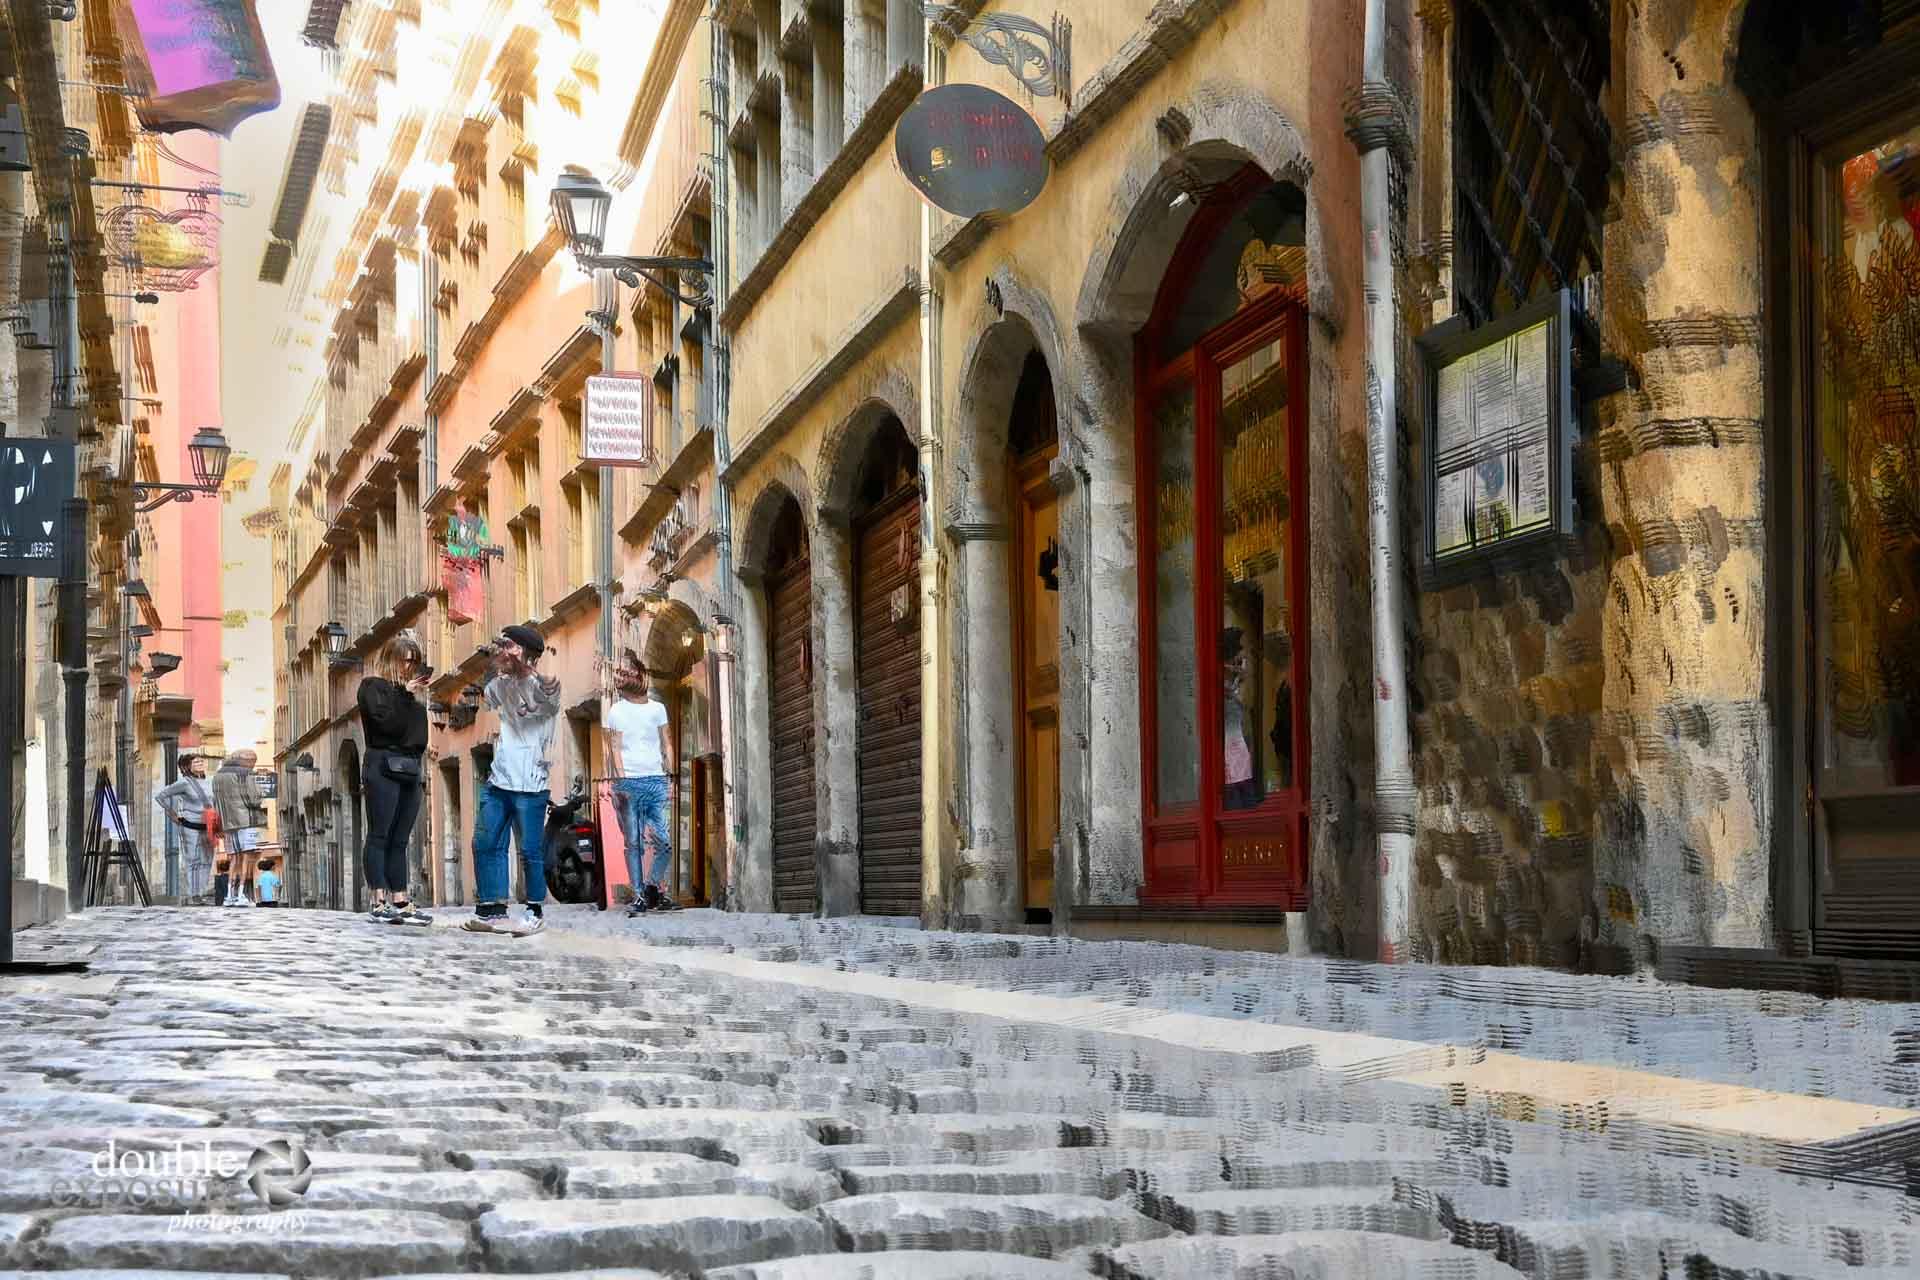 cobblestone street of Lyon, France